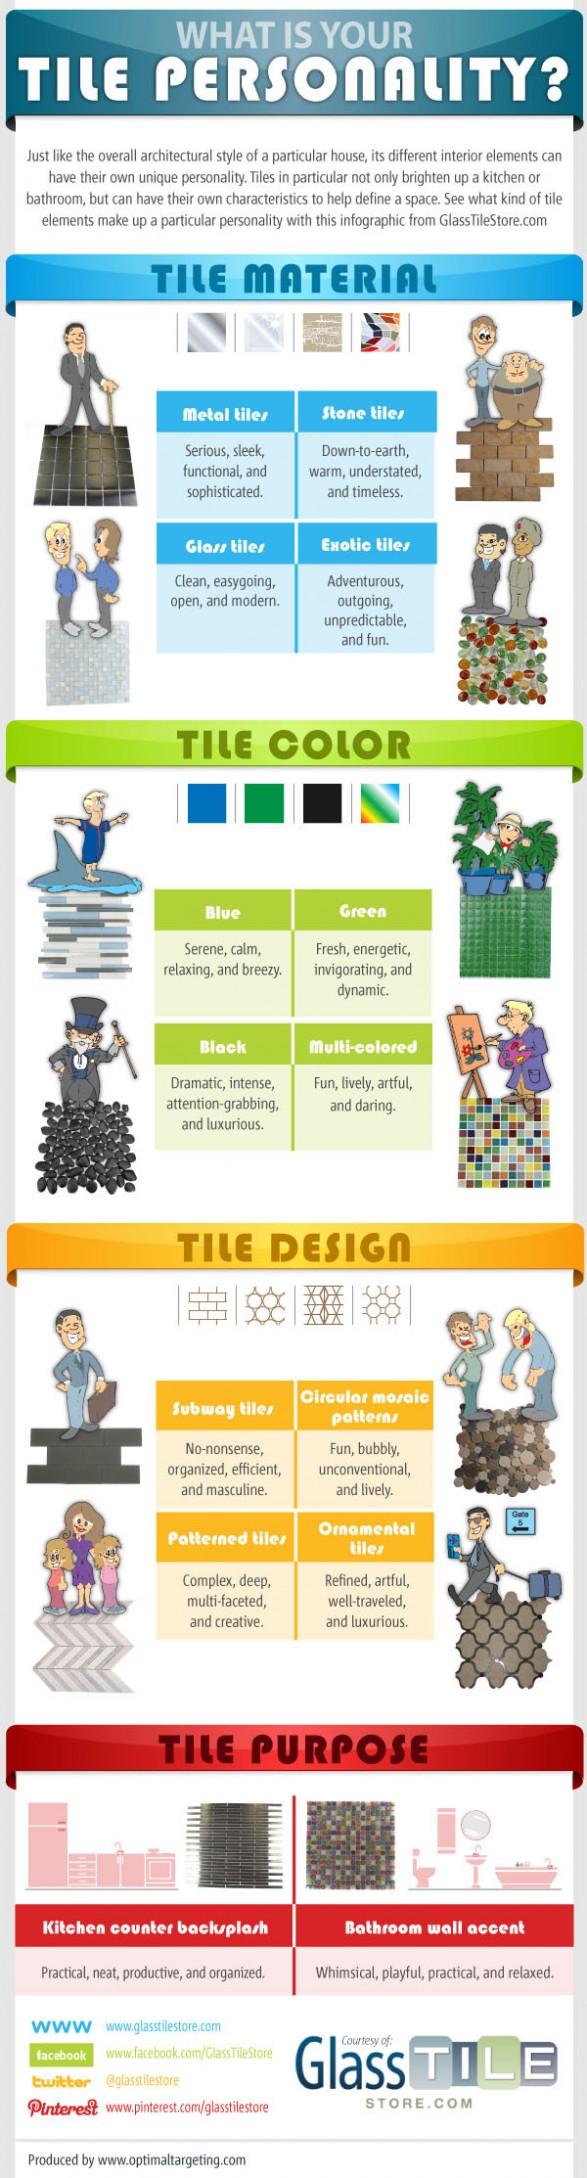 301 excellent tile company names